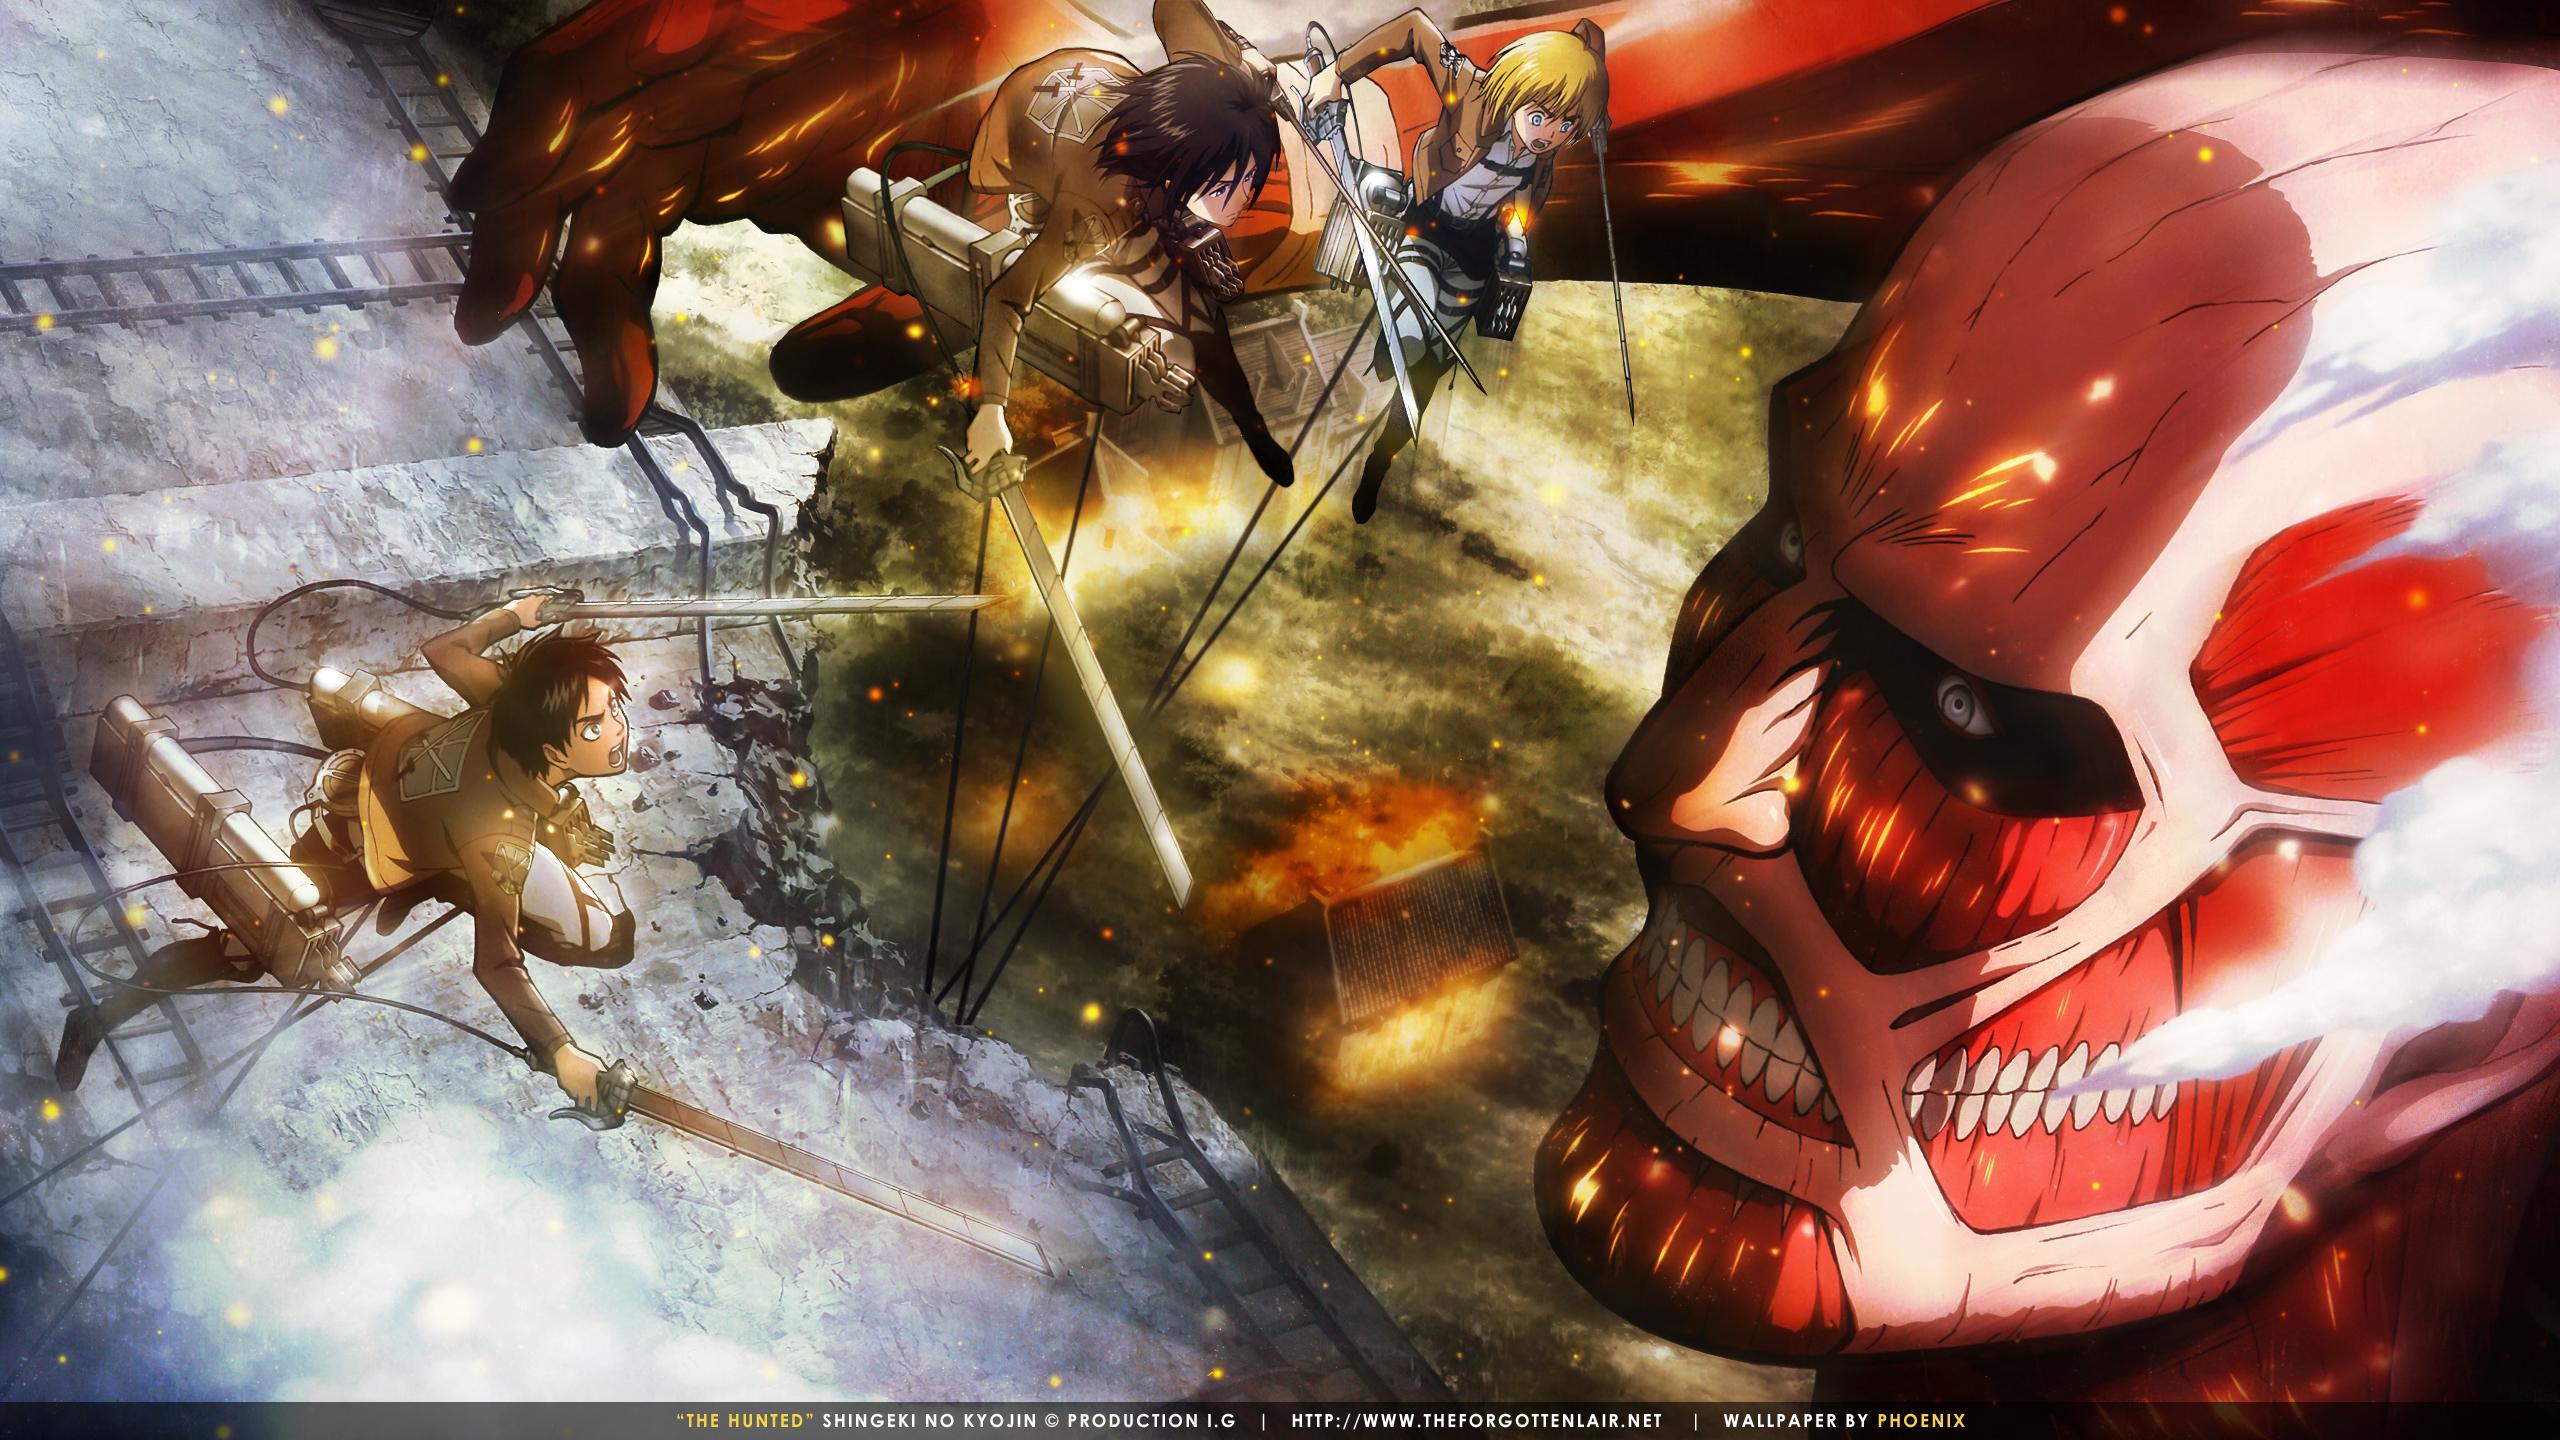 Hajime Isayama Production I Attack On Titan Wallpaper 1920 X 1080 1920x1080 Download Hd Wallpaper Wallpapertip